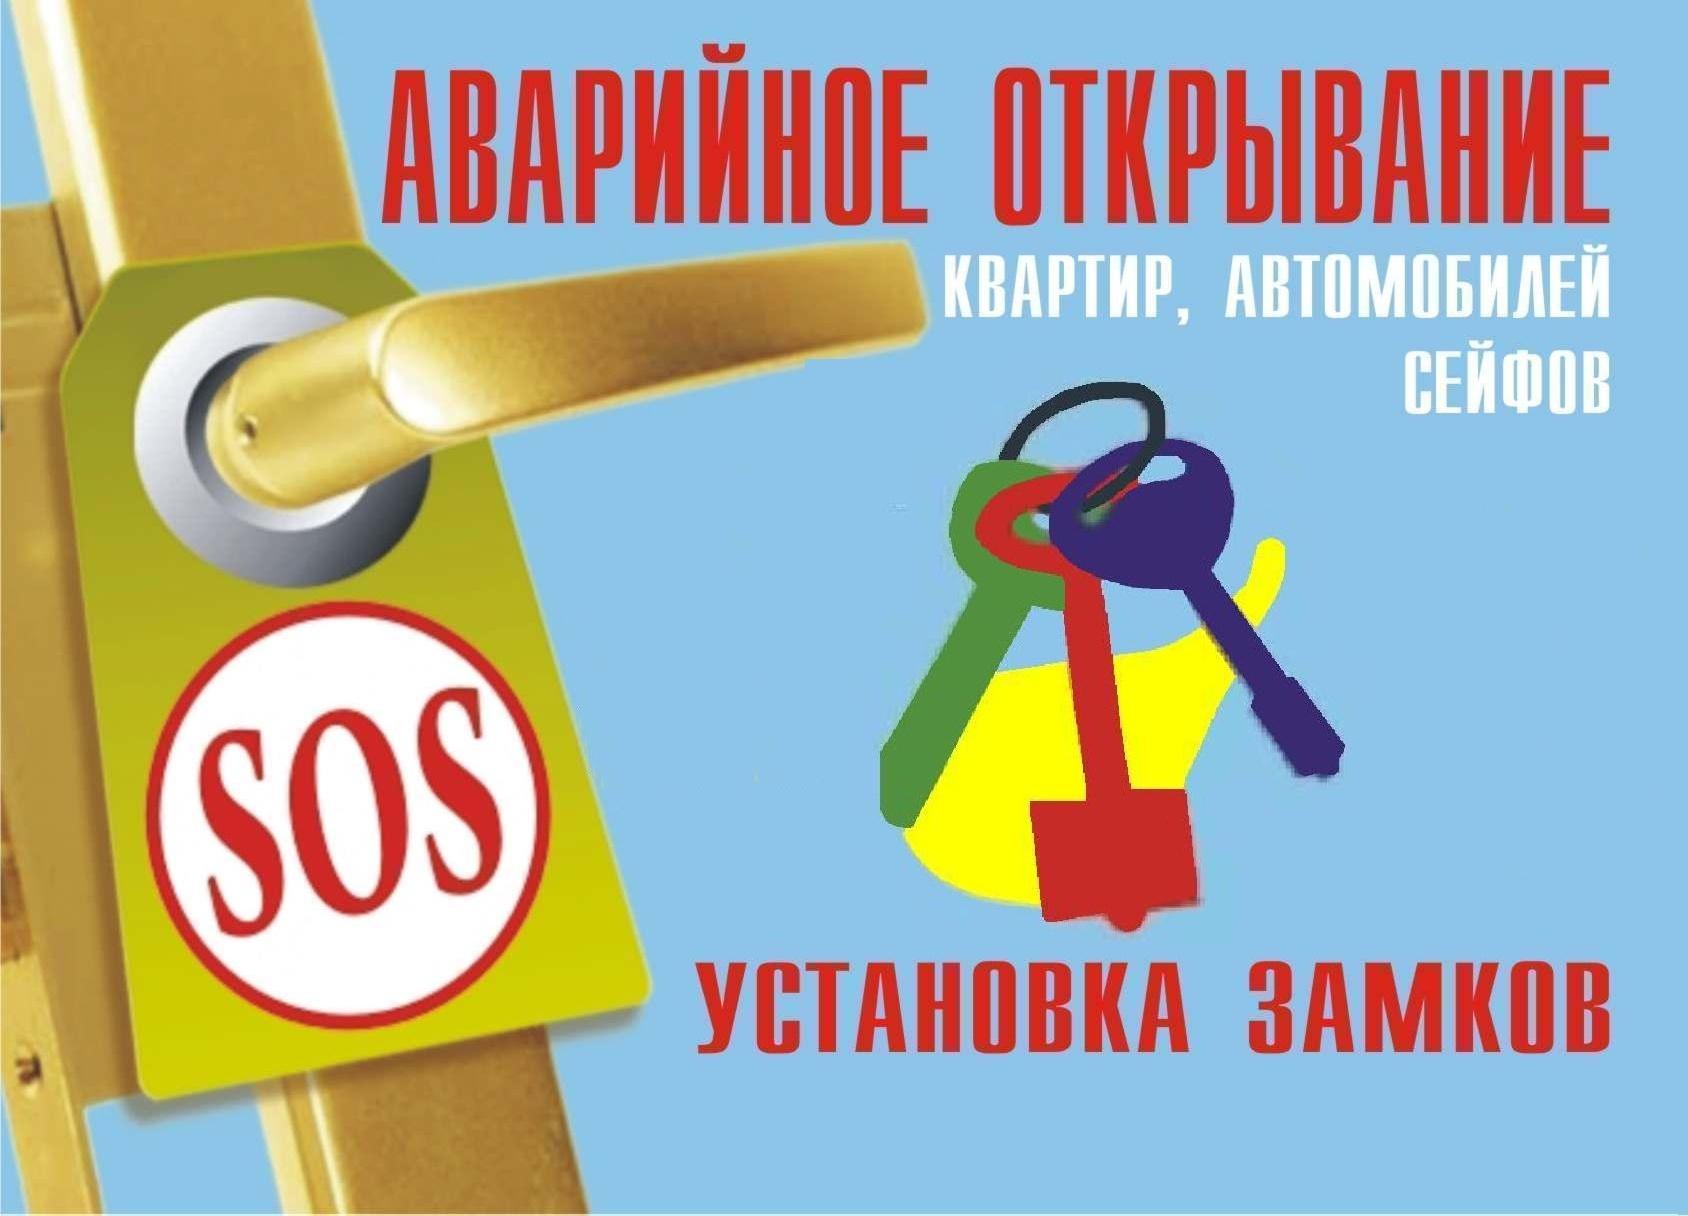 Графика сыктывкар, бесплатные фото ...: pictures11.ru/grafika-syktyvkar.html